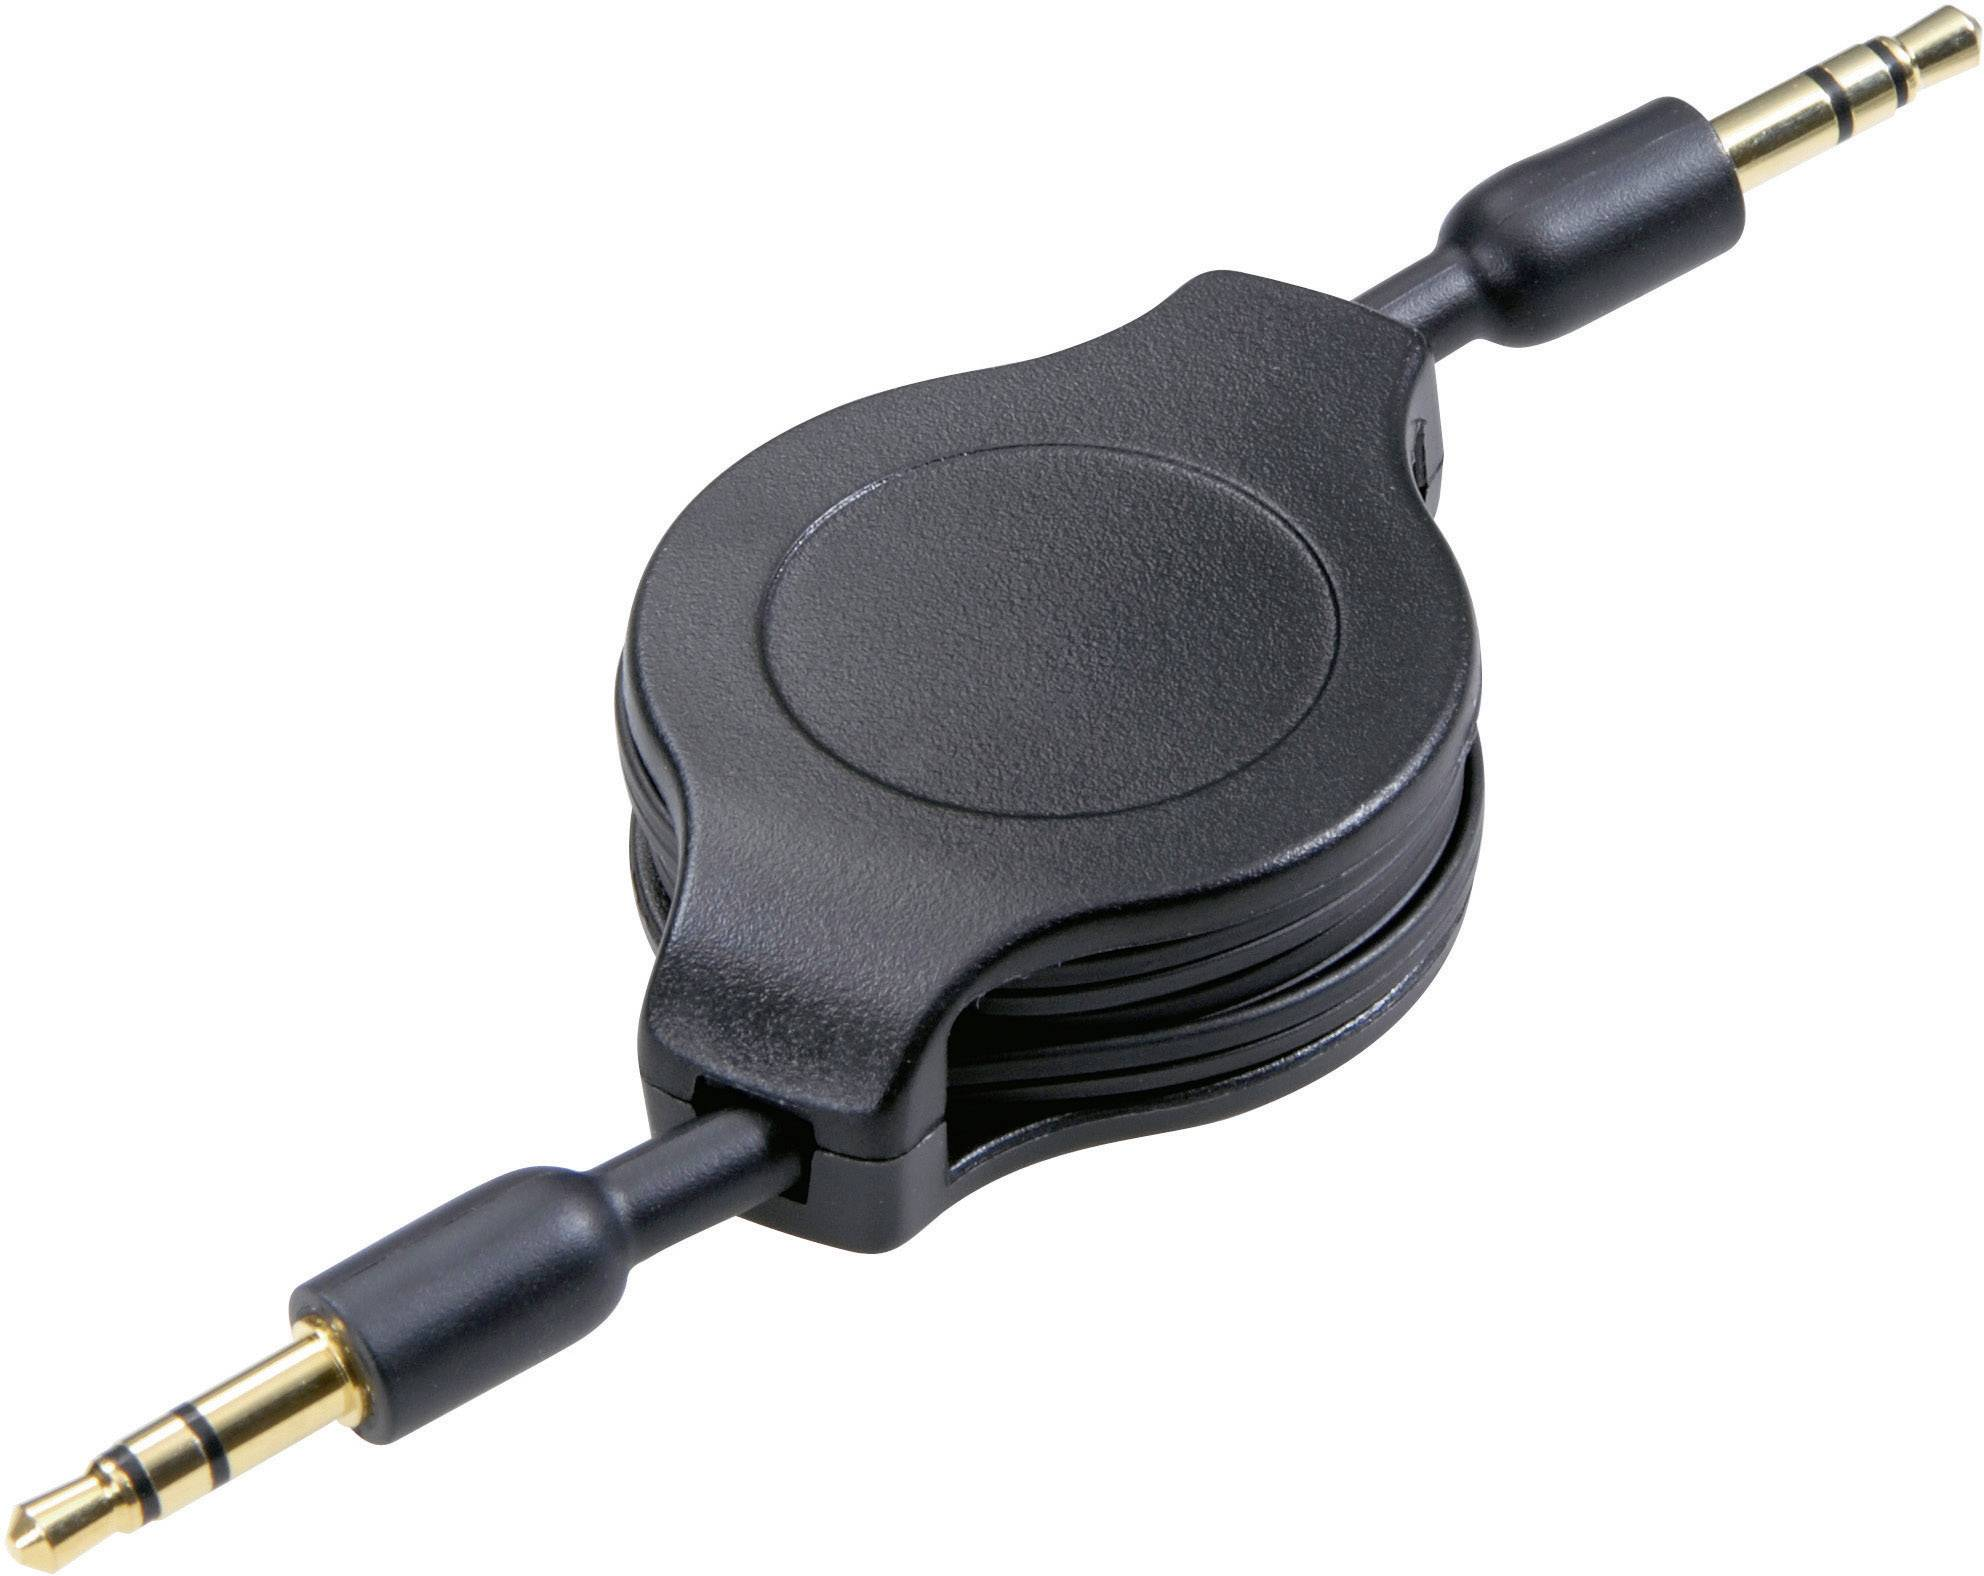 Jack audio kábel SpeaKa Professional SP-1300276, 1.10 m, čierna